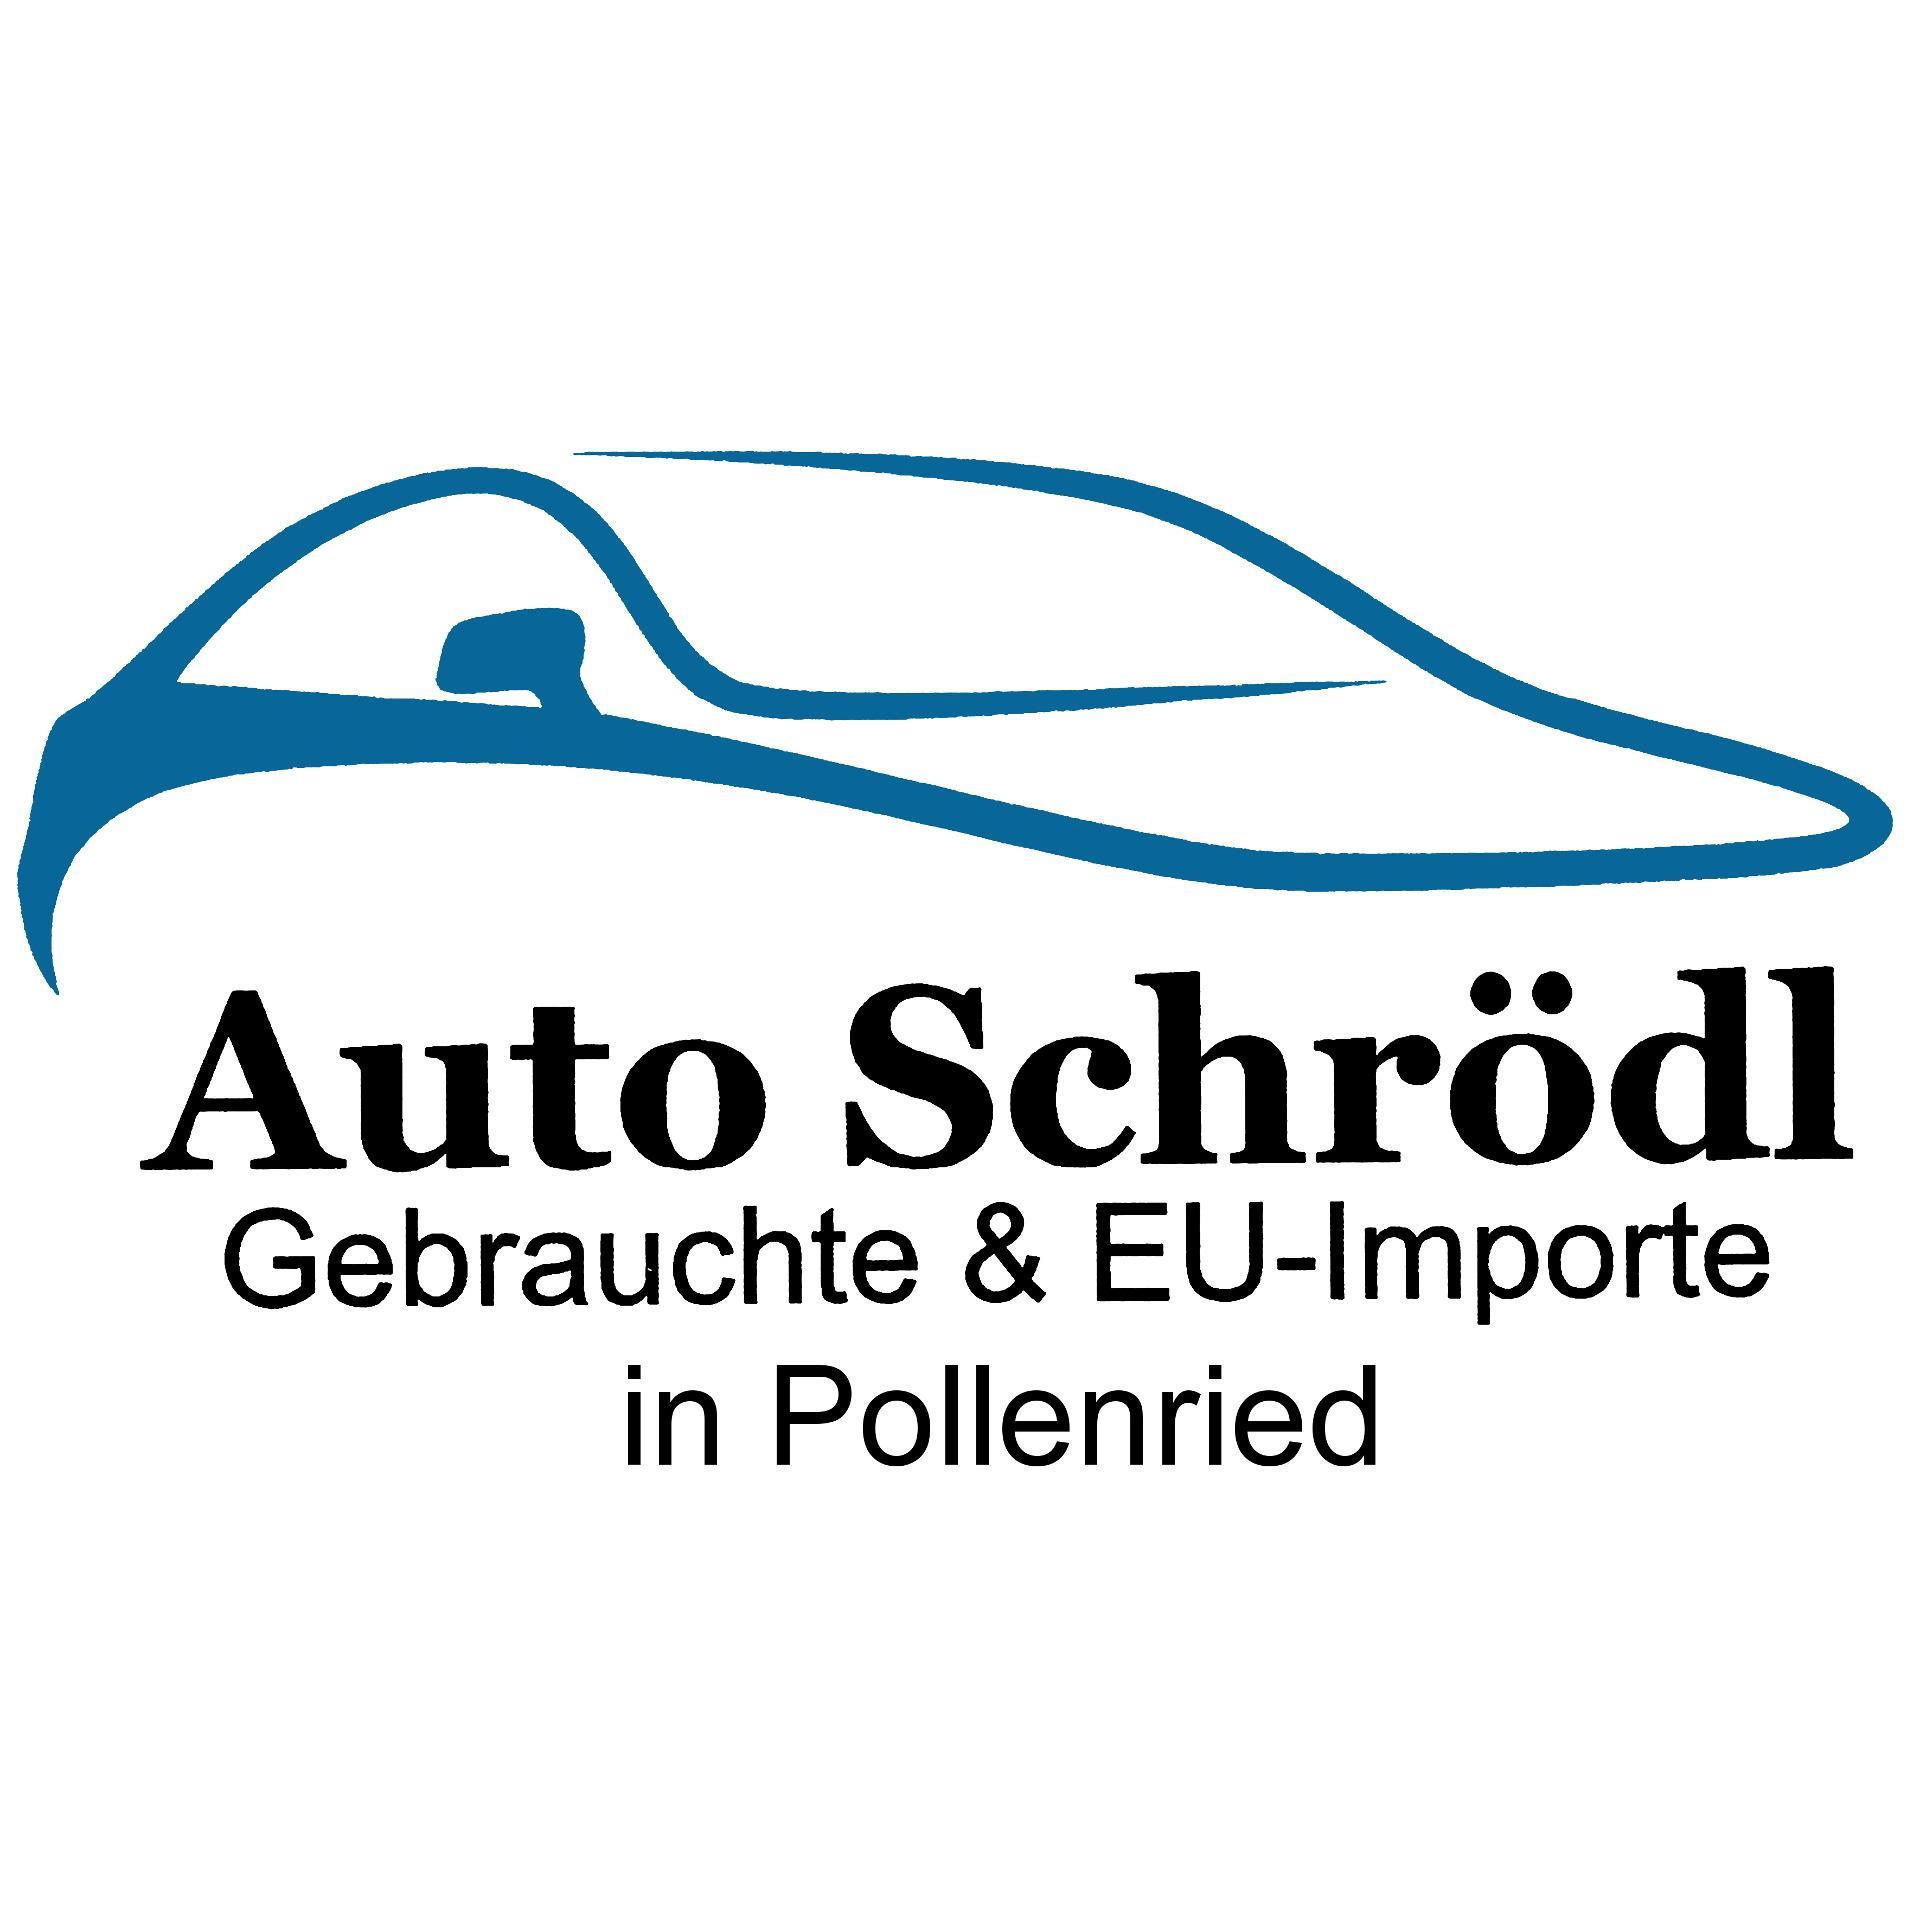 Auto Schrödl Pollenried